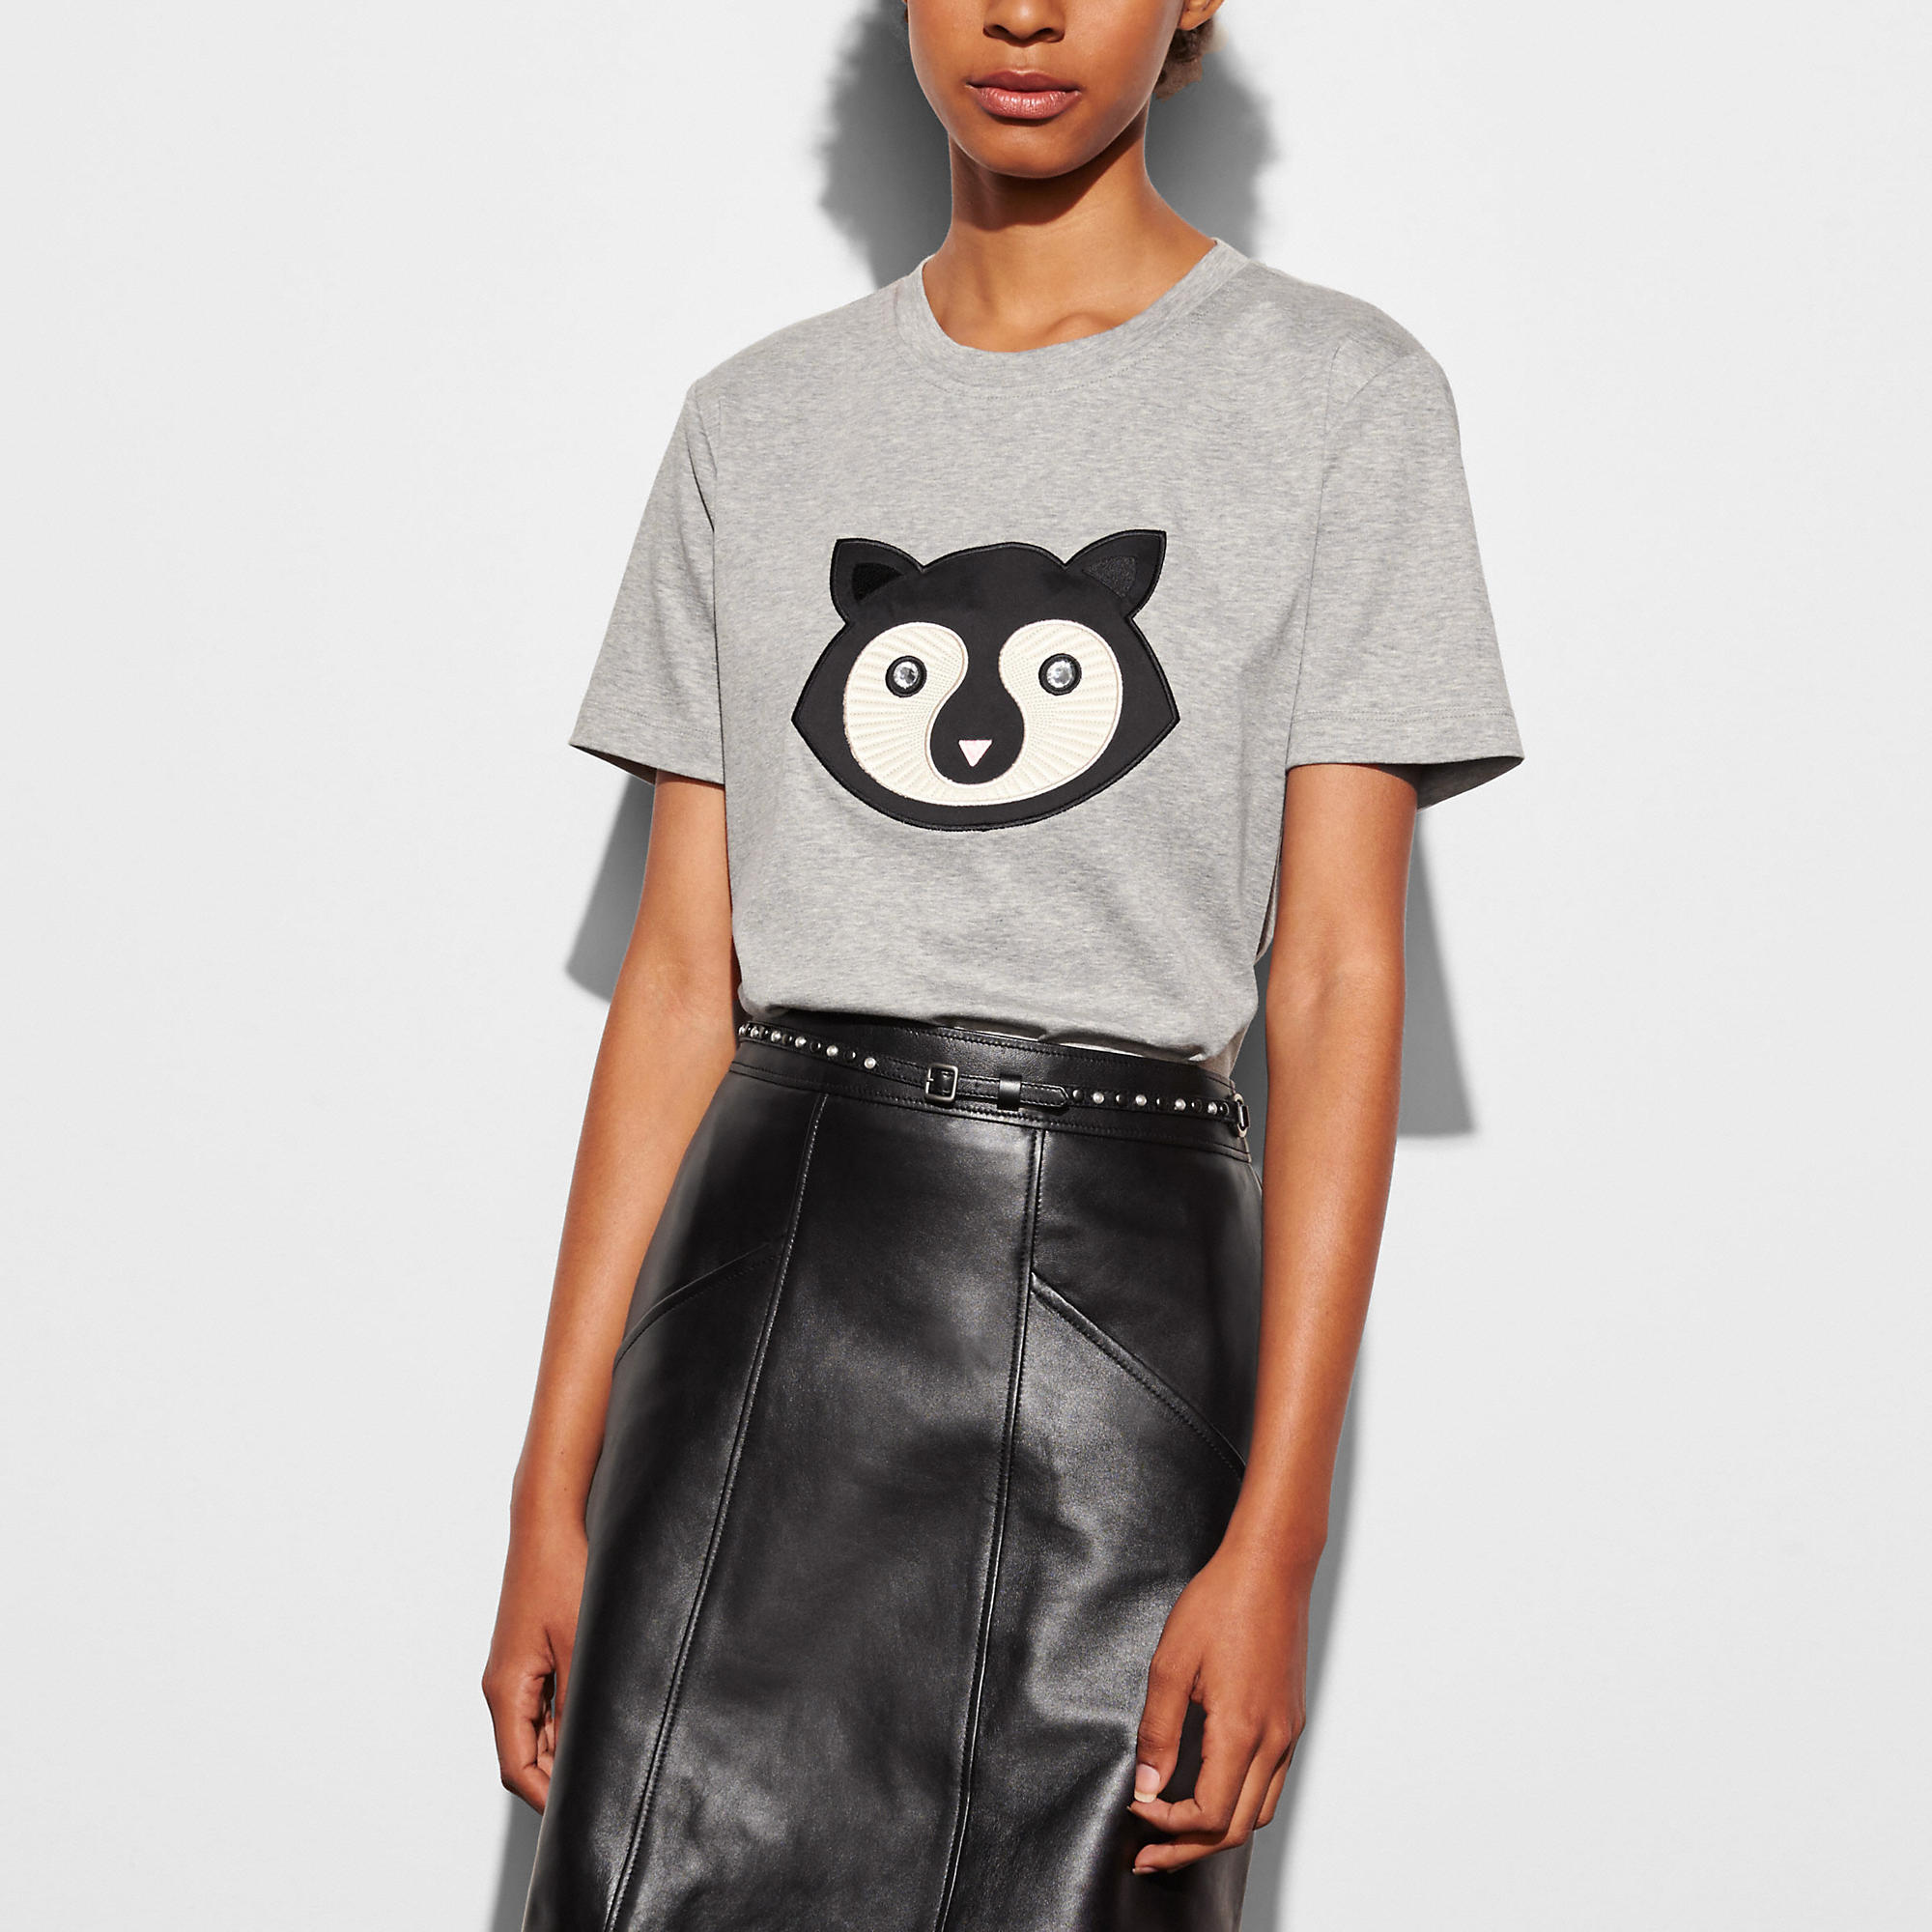 Coach Embellished Patch Raccoon T-Shirt